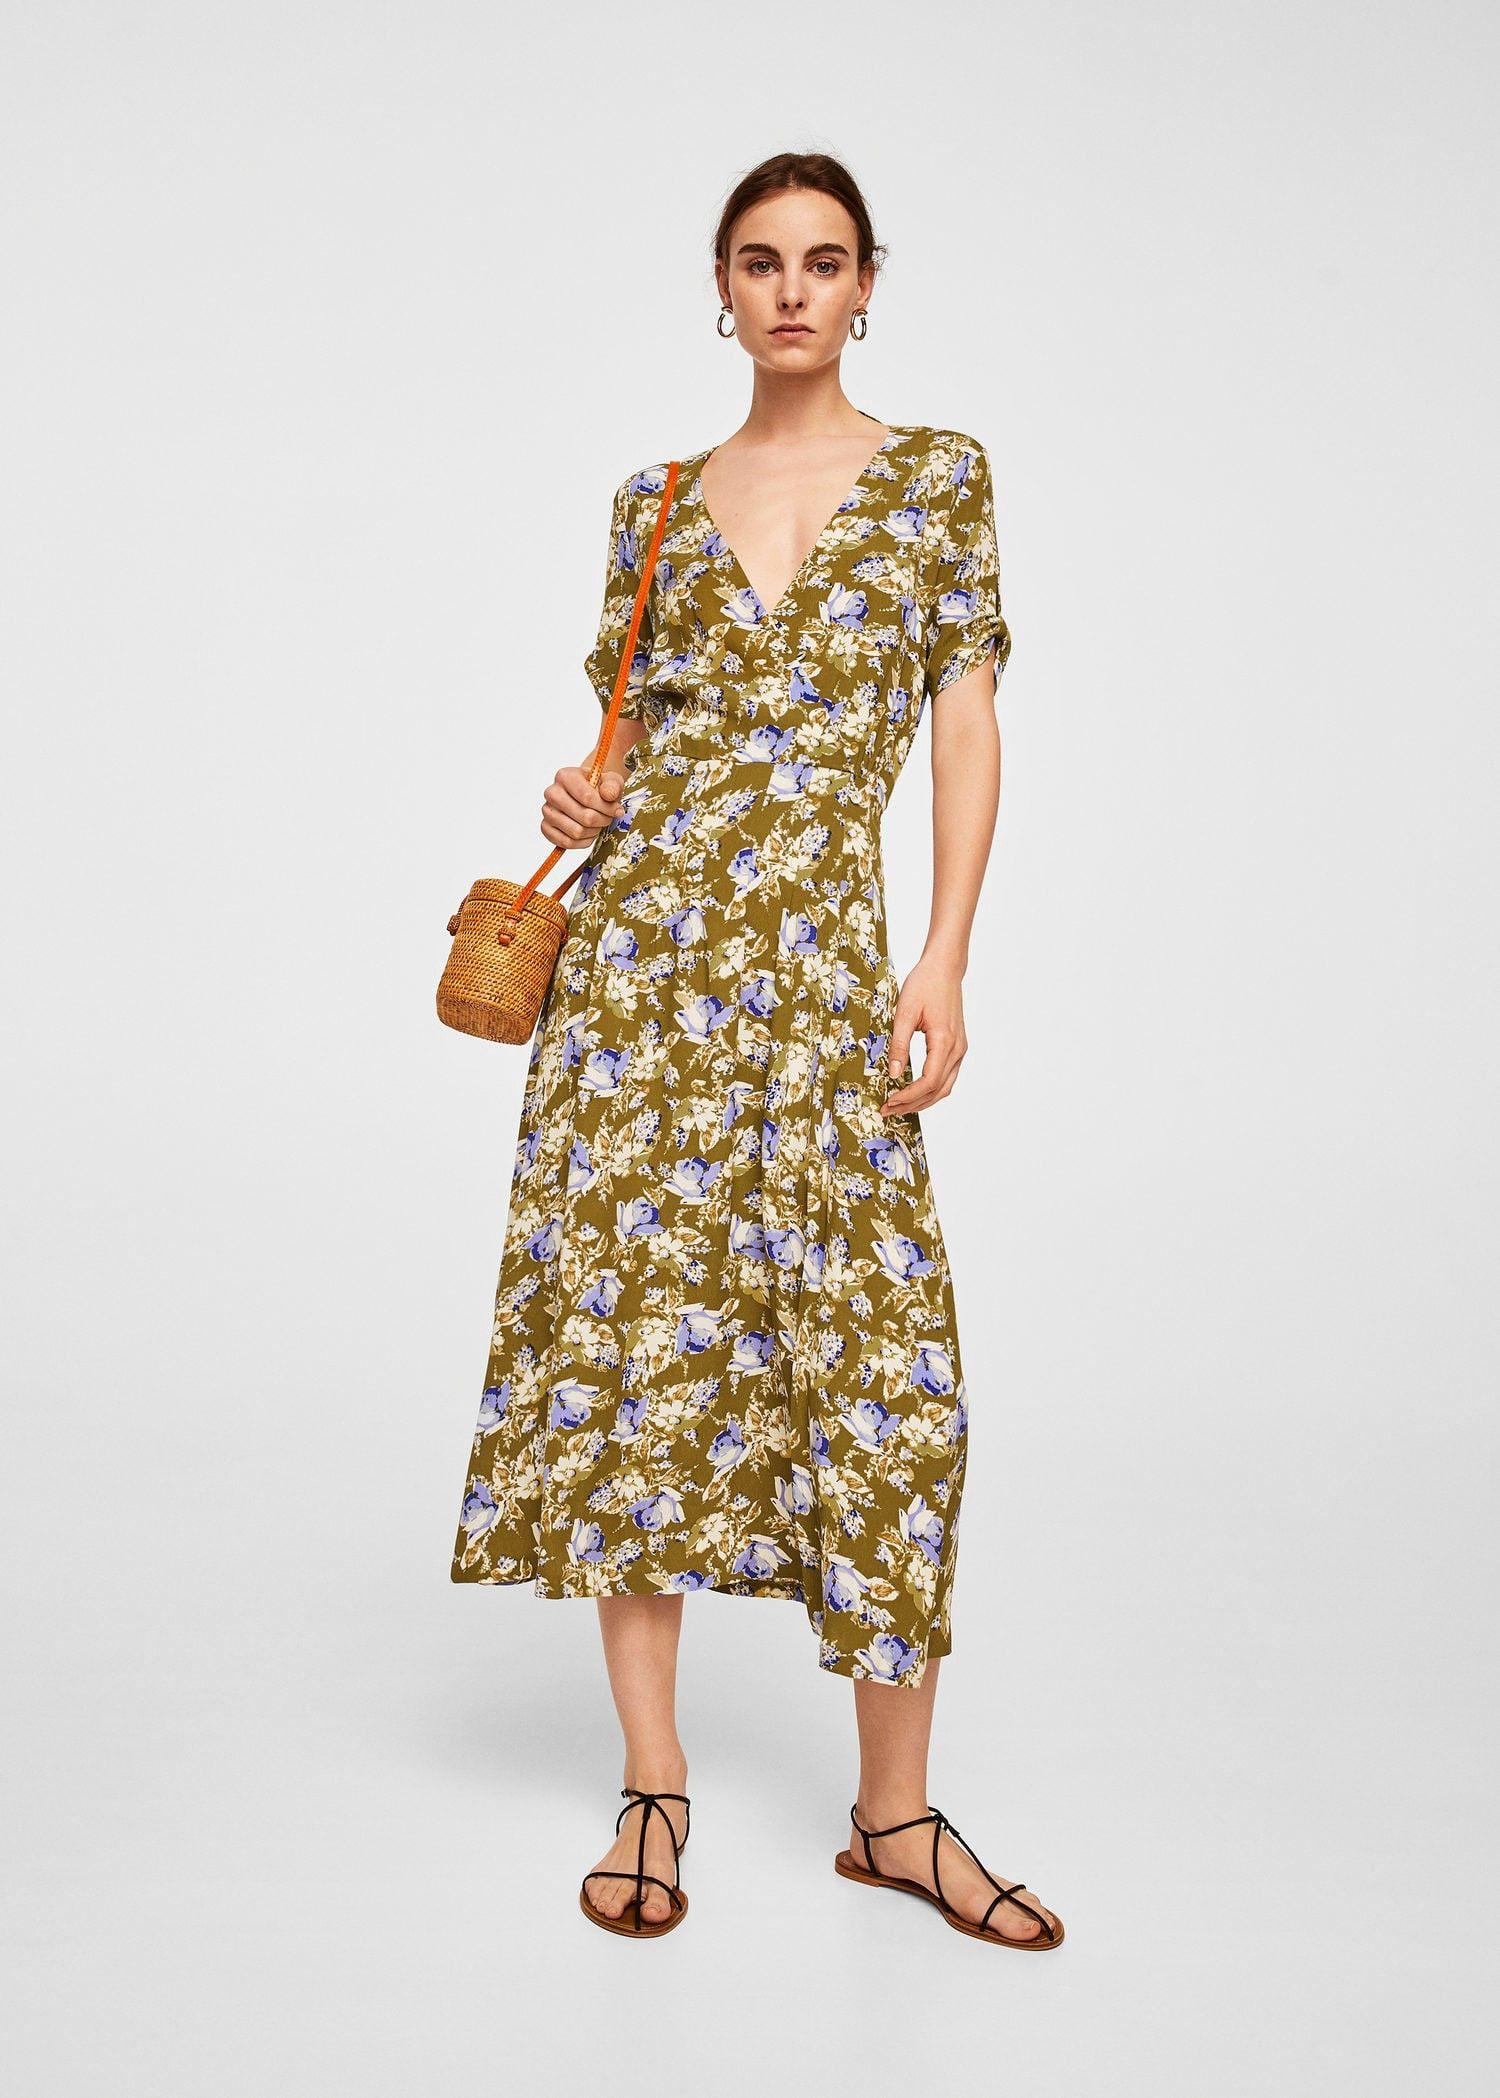 2dd84b916f7ff Mango Floral Wrap Neckline Dress - 8 Robes Midi, Wrap Dresses, Khaki Dress,